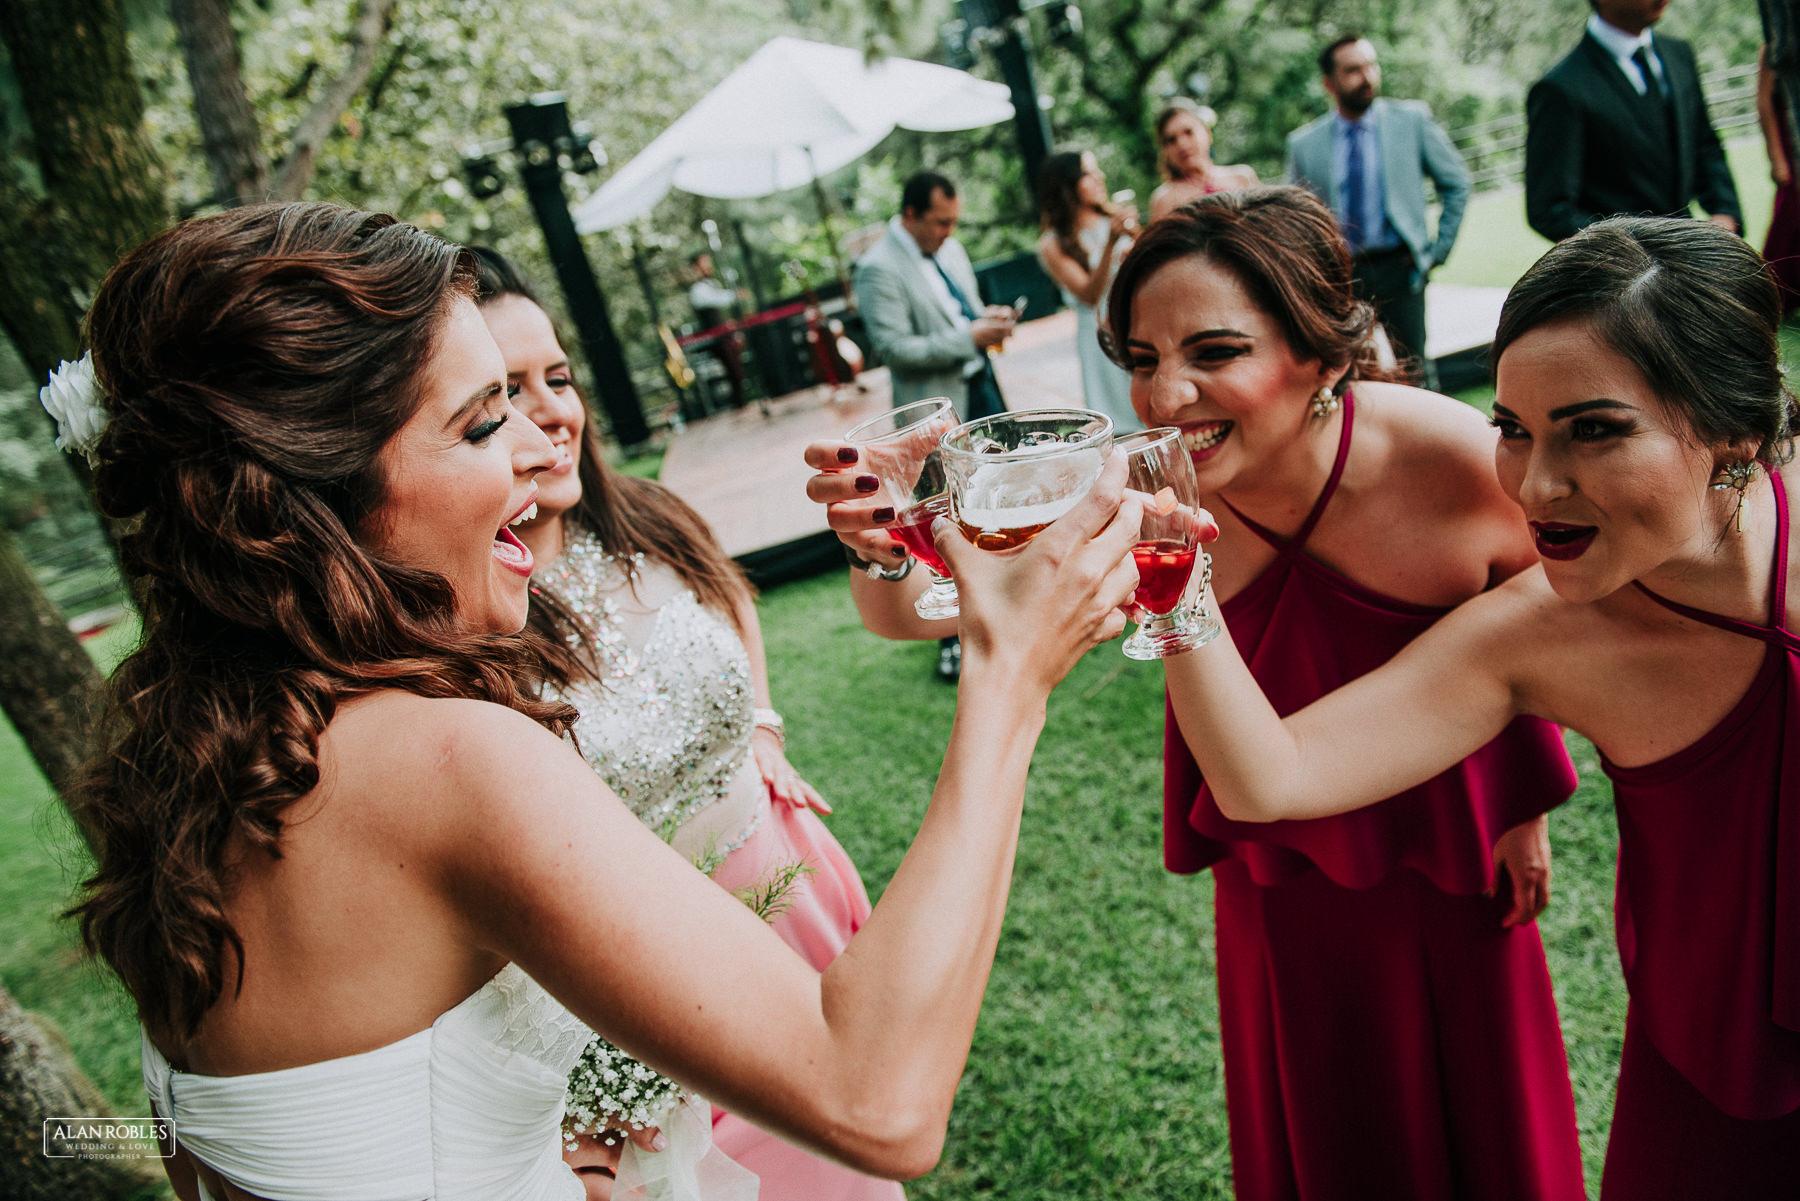 Fotografo de bodas guadalajara Alan Robles - Pinare terraza bistro 27